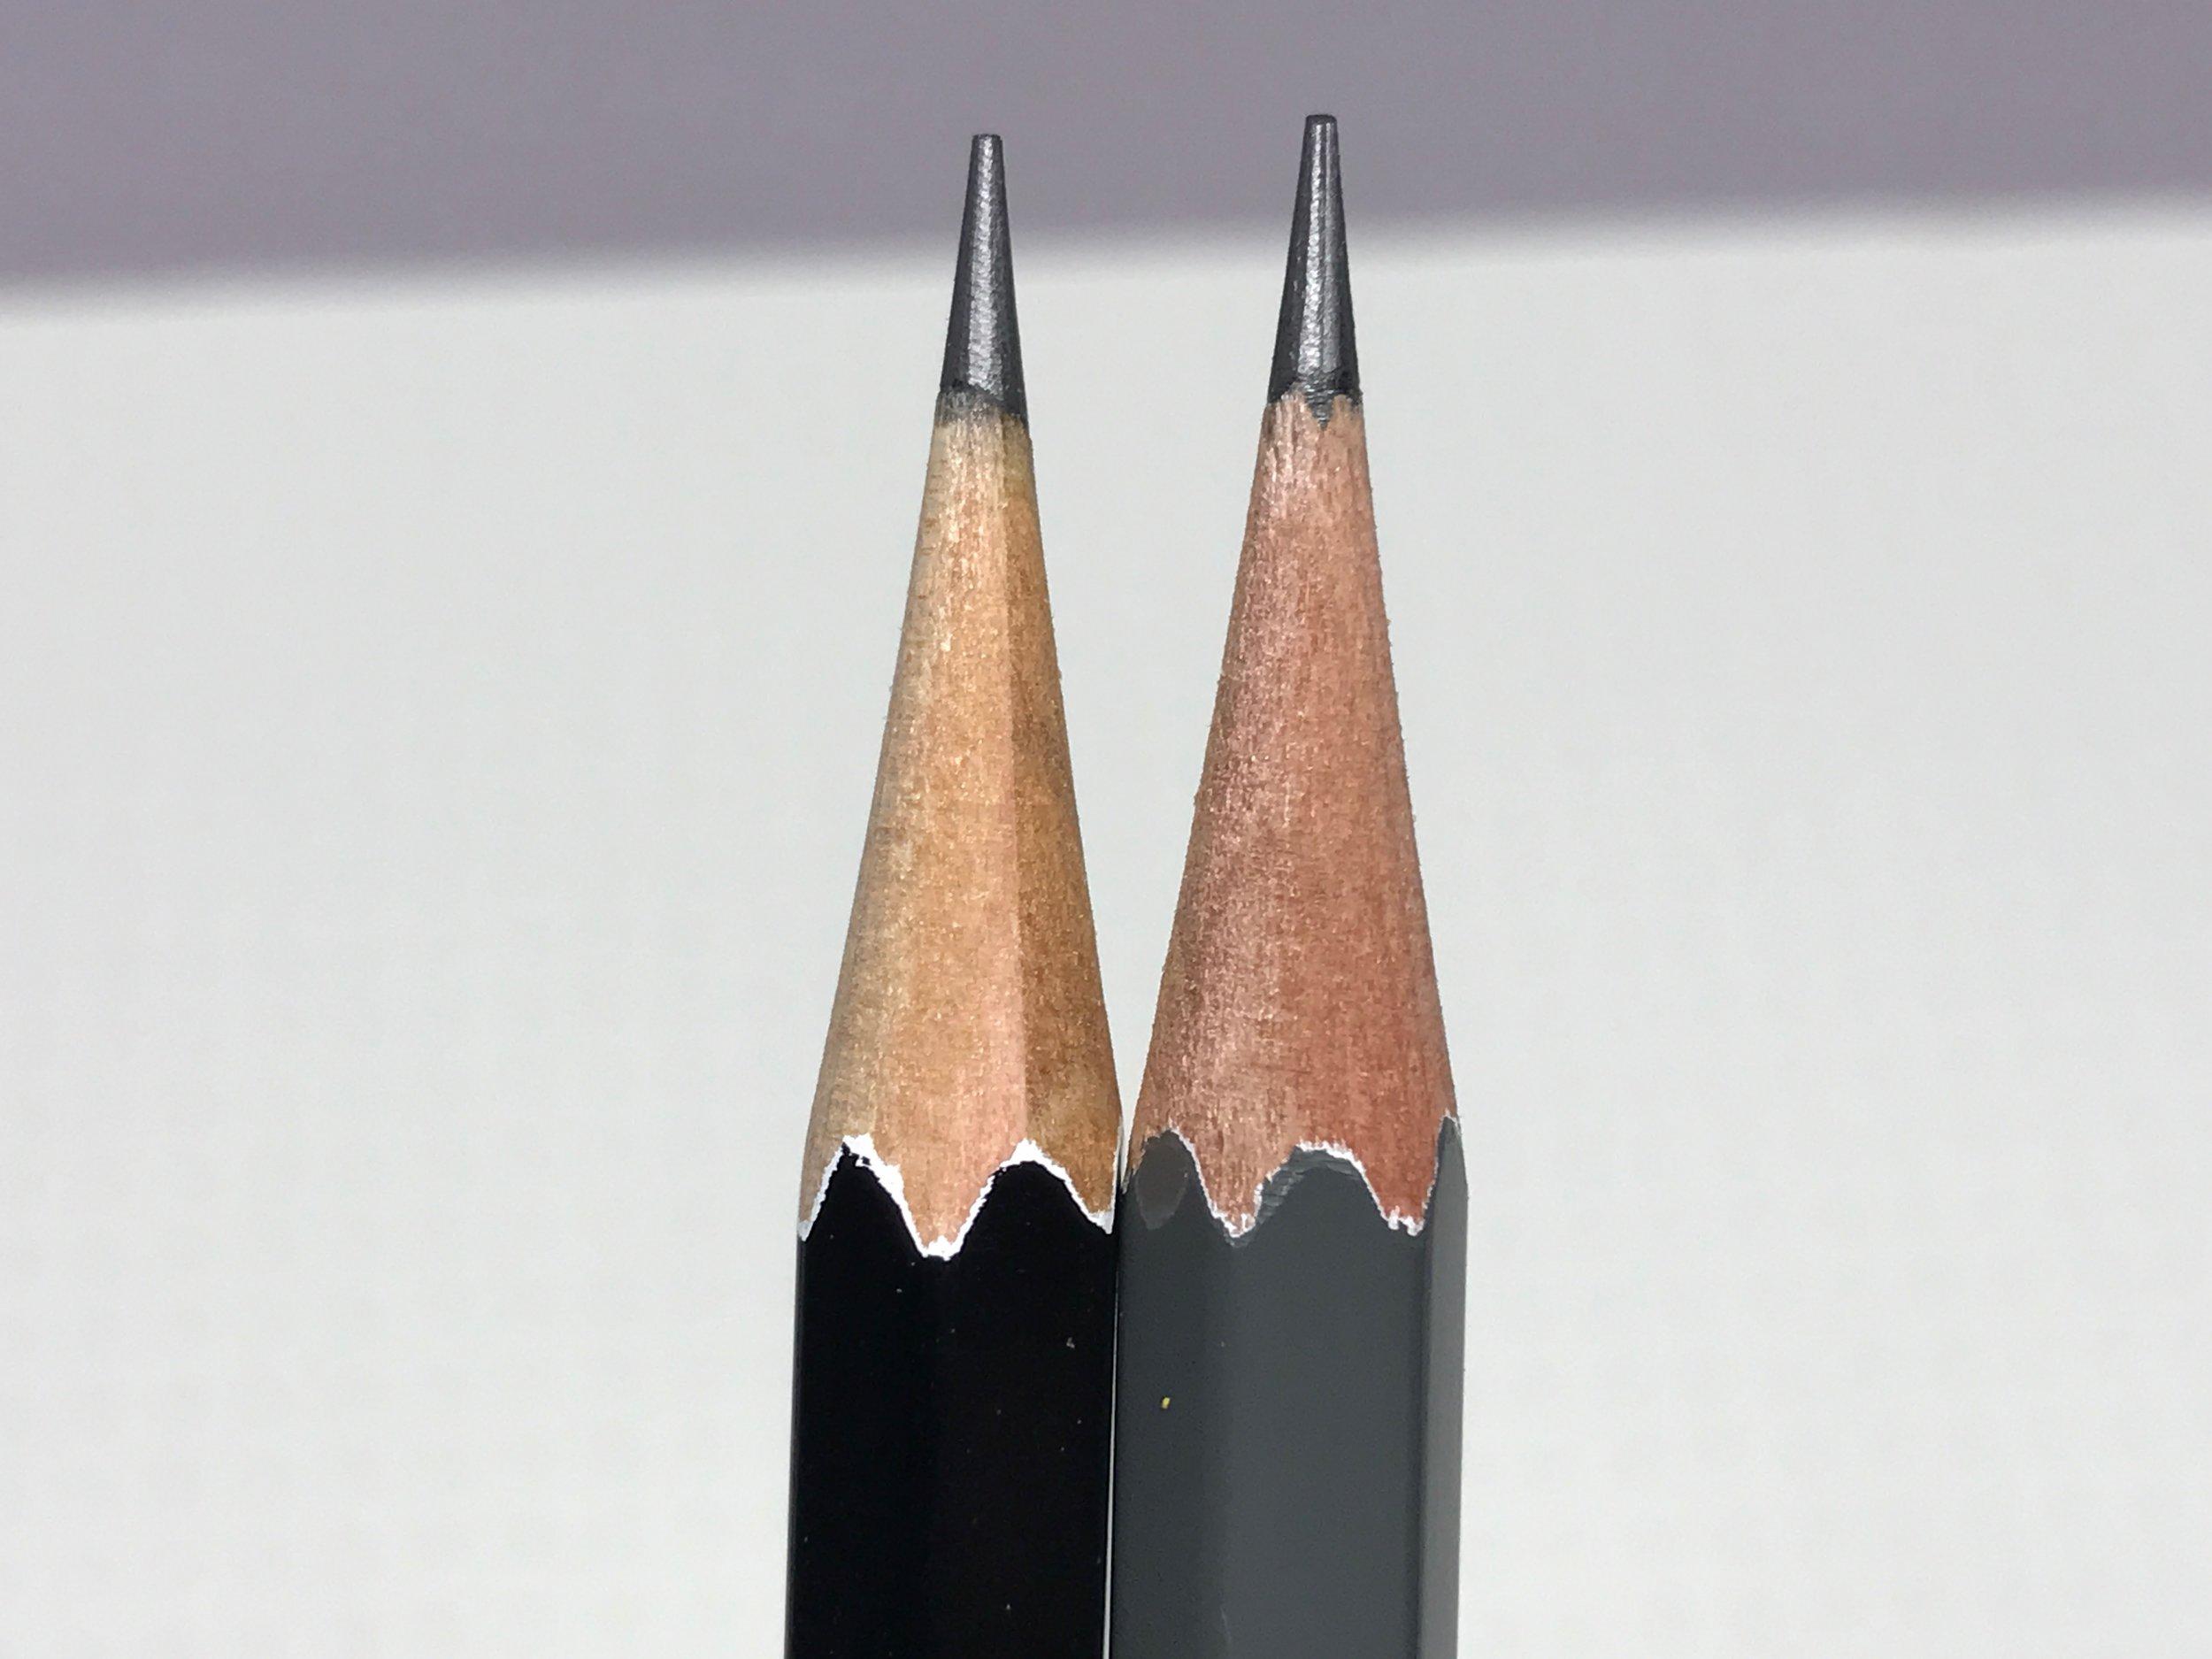 Tombow-Mitsubishi-Mark-Sheet-1.jpg